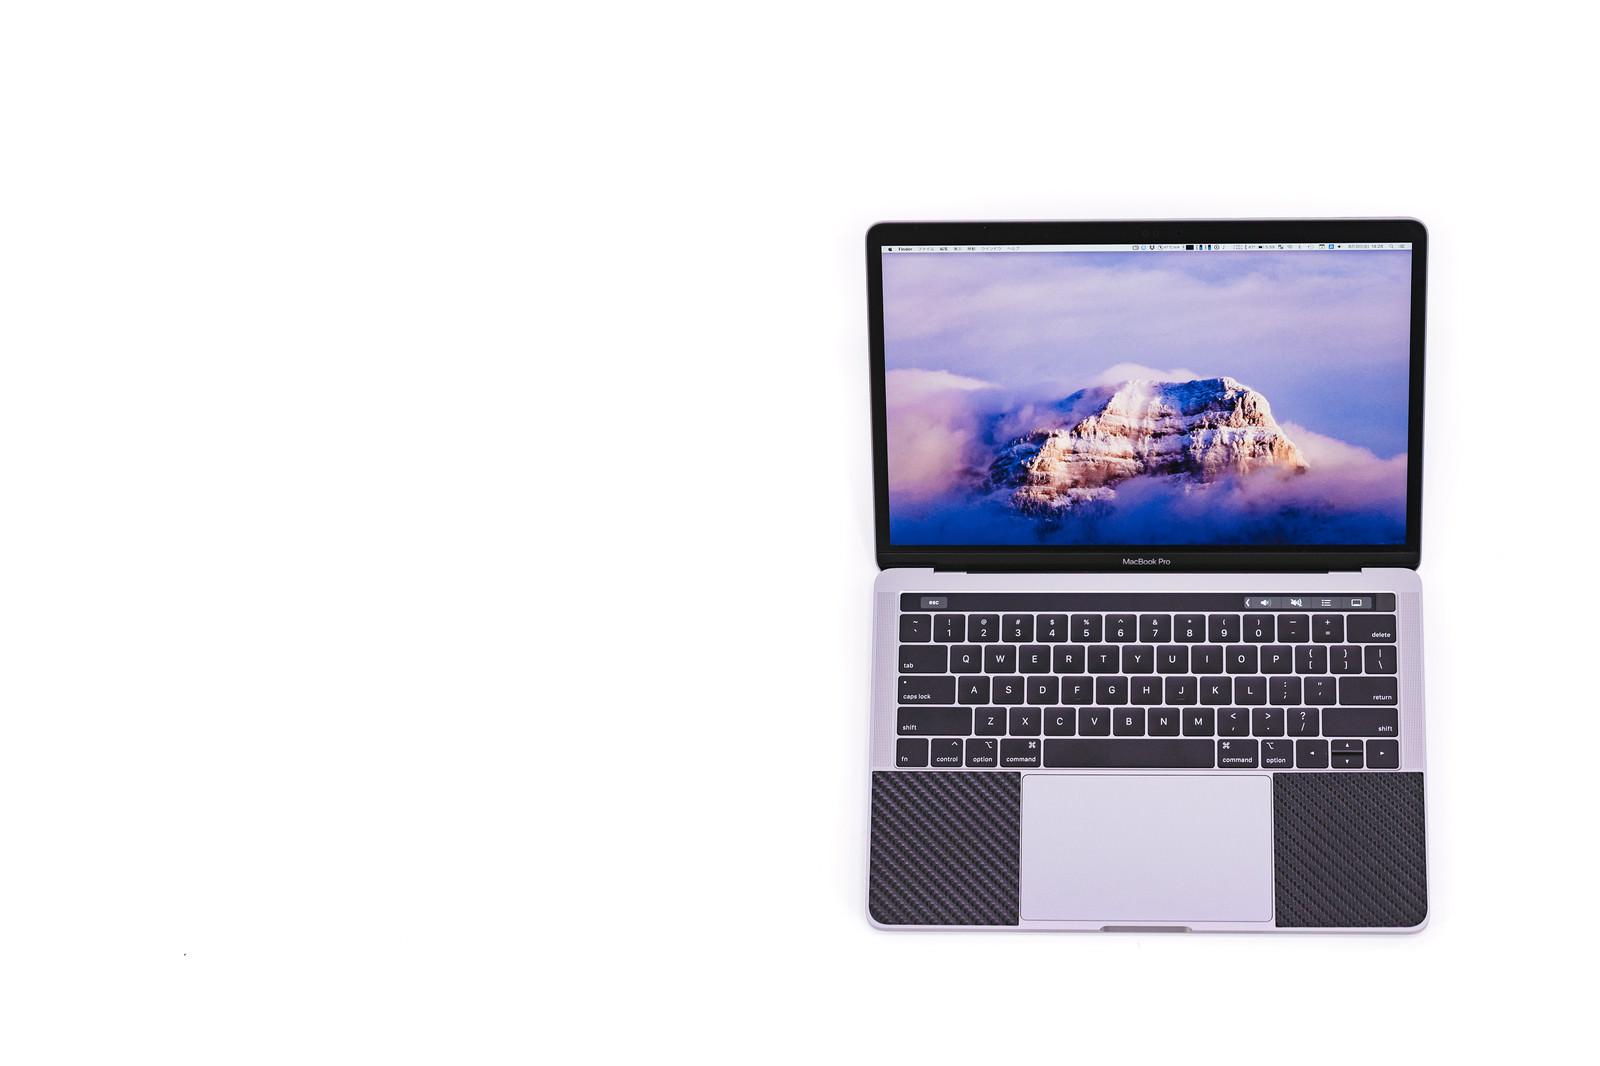 GoriIMGL9737 TP V macbook pro gori